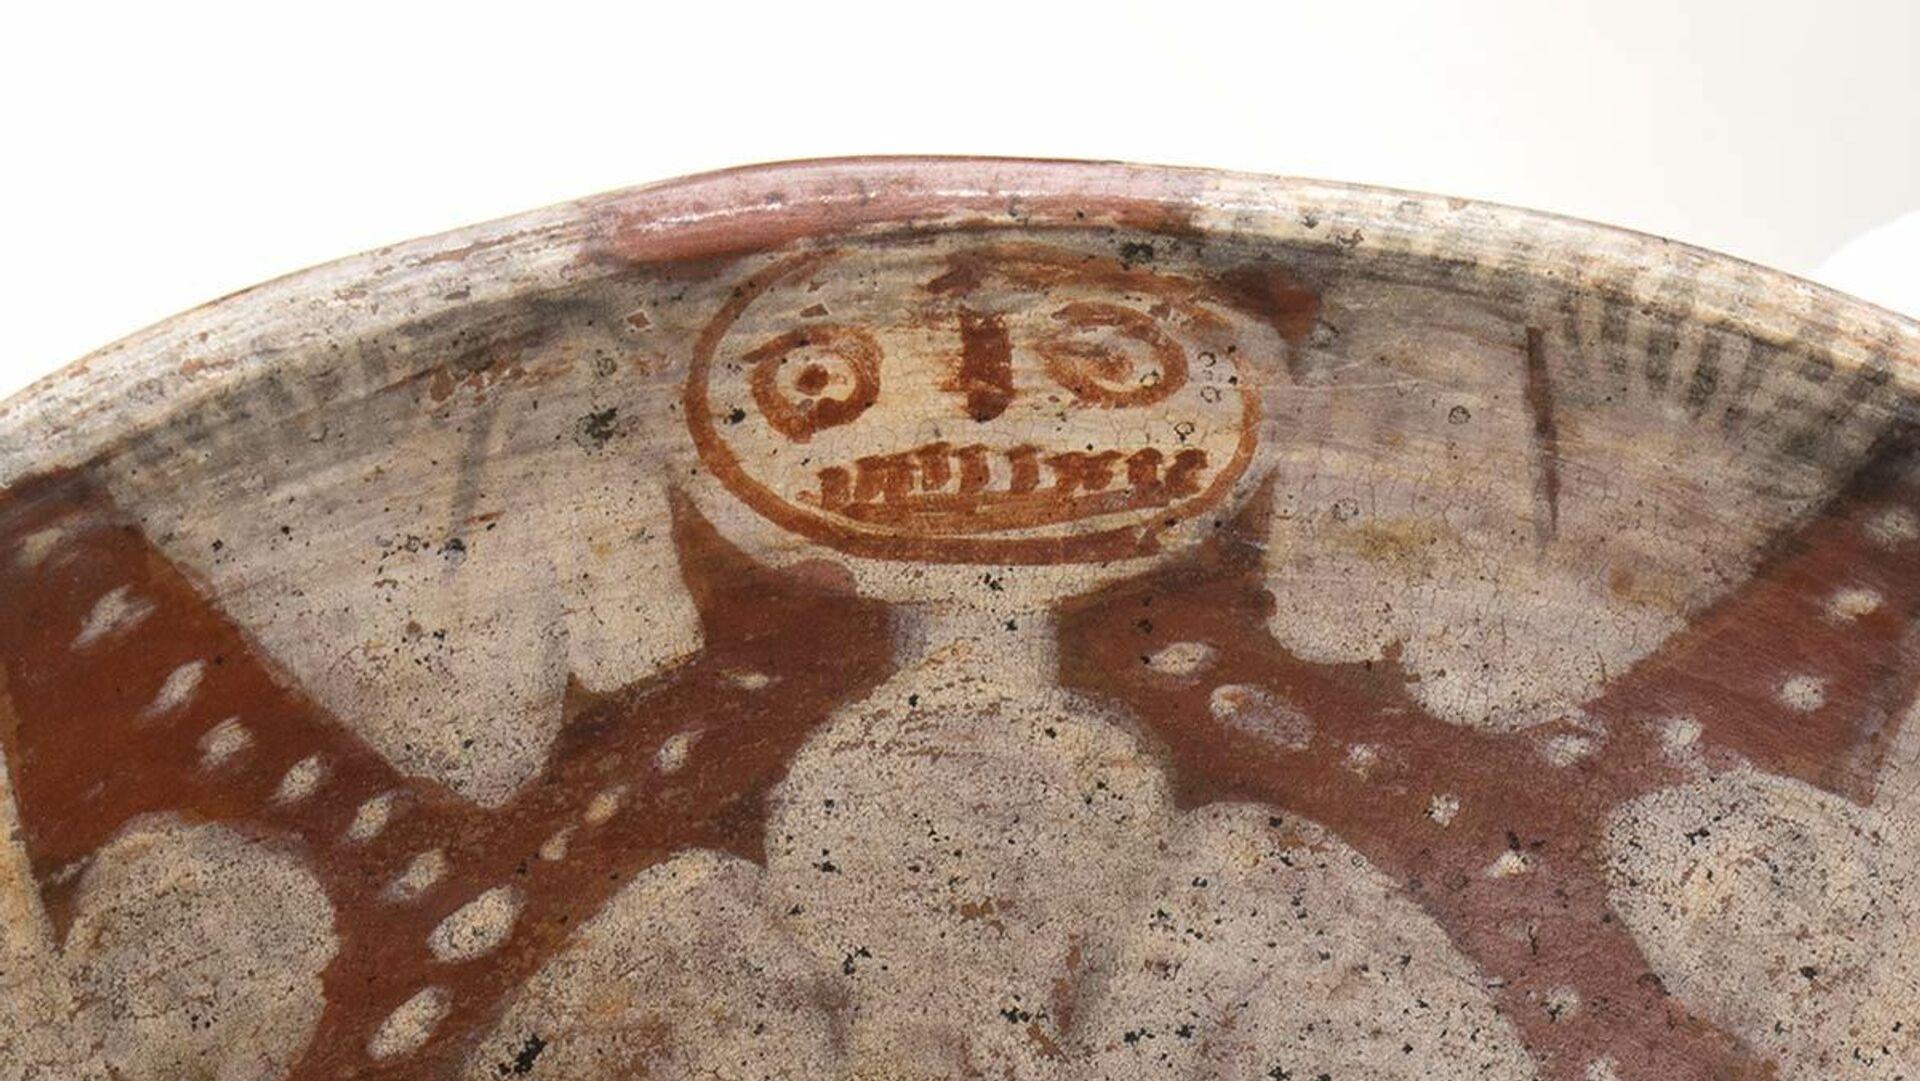 Pieza arqueológica recuperada por el INAH - Sputnik Mundo, 1920, 20.09.2021